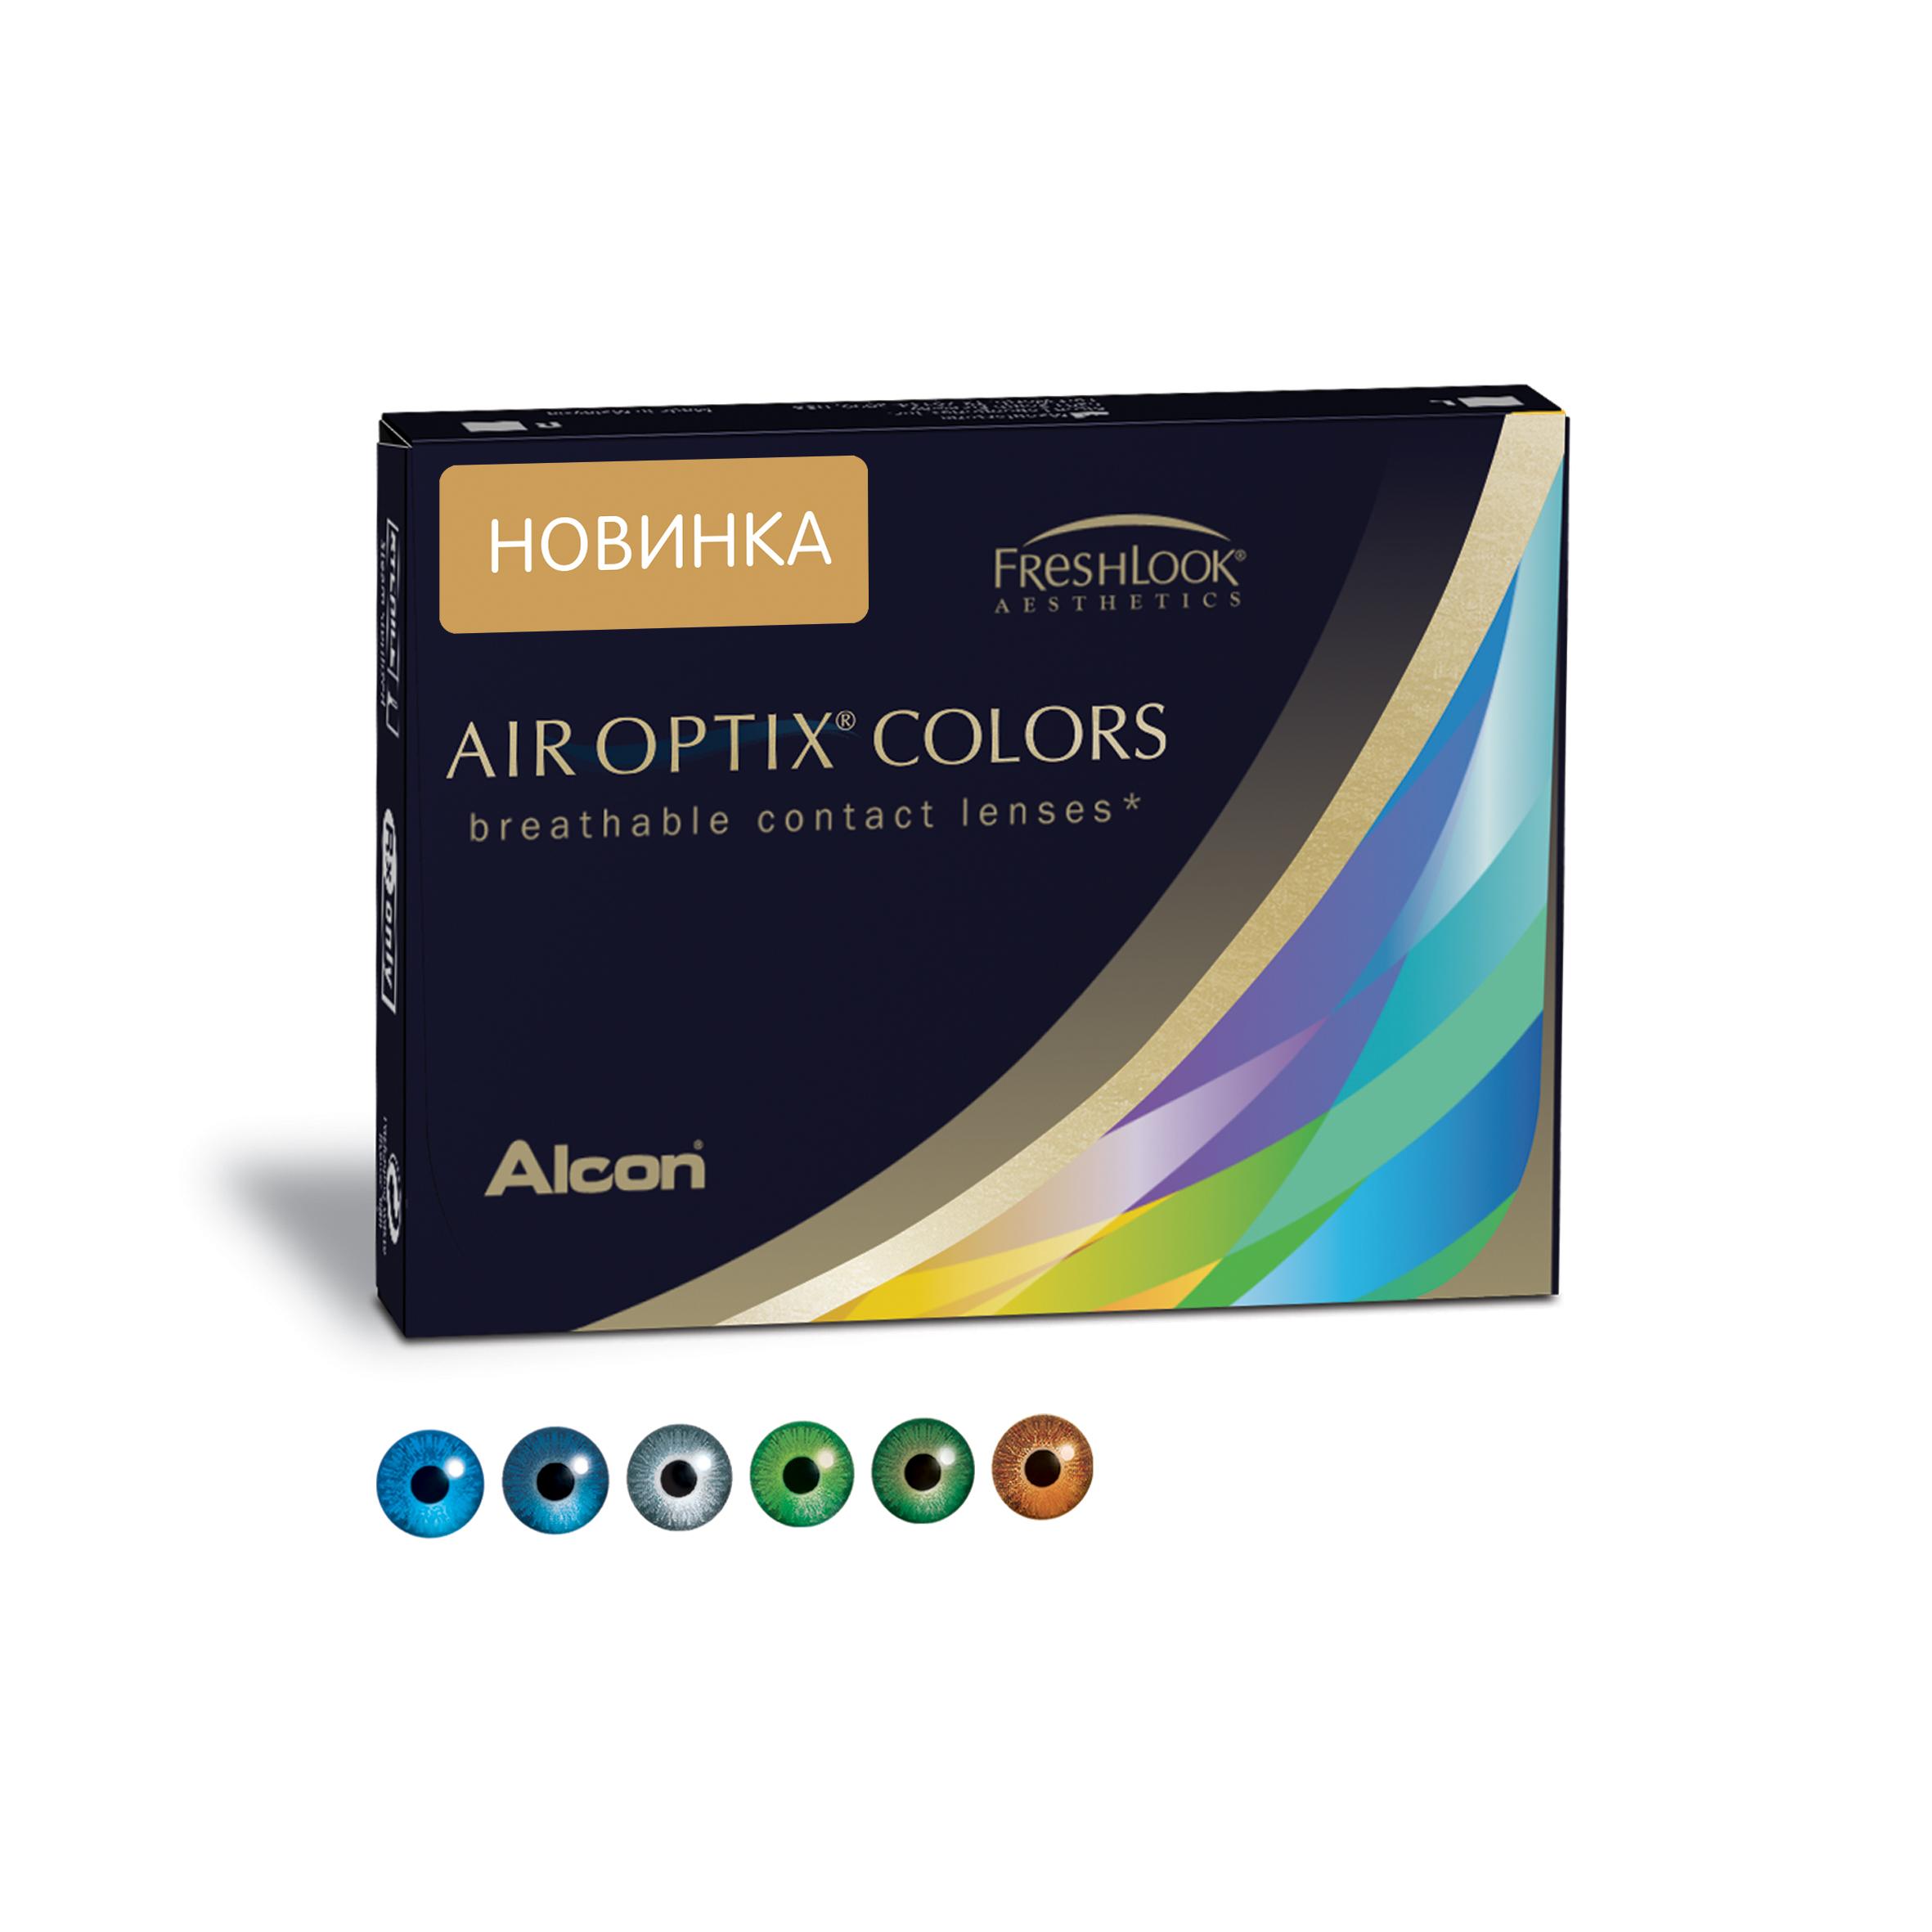 Аlcon контактные линзы Air Optix Colors 2 шт -0.50 Honey31746109Мягкие контактные линзы